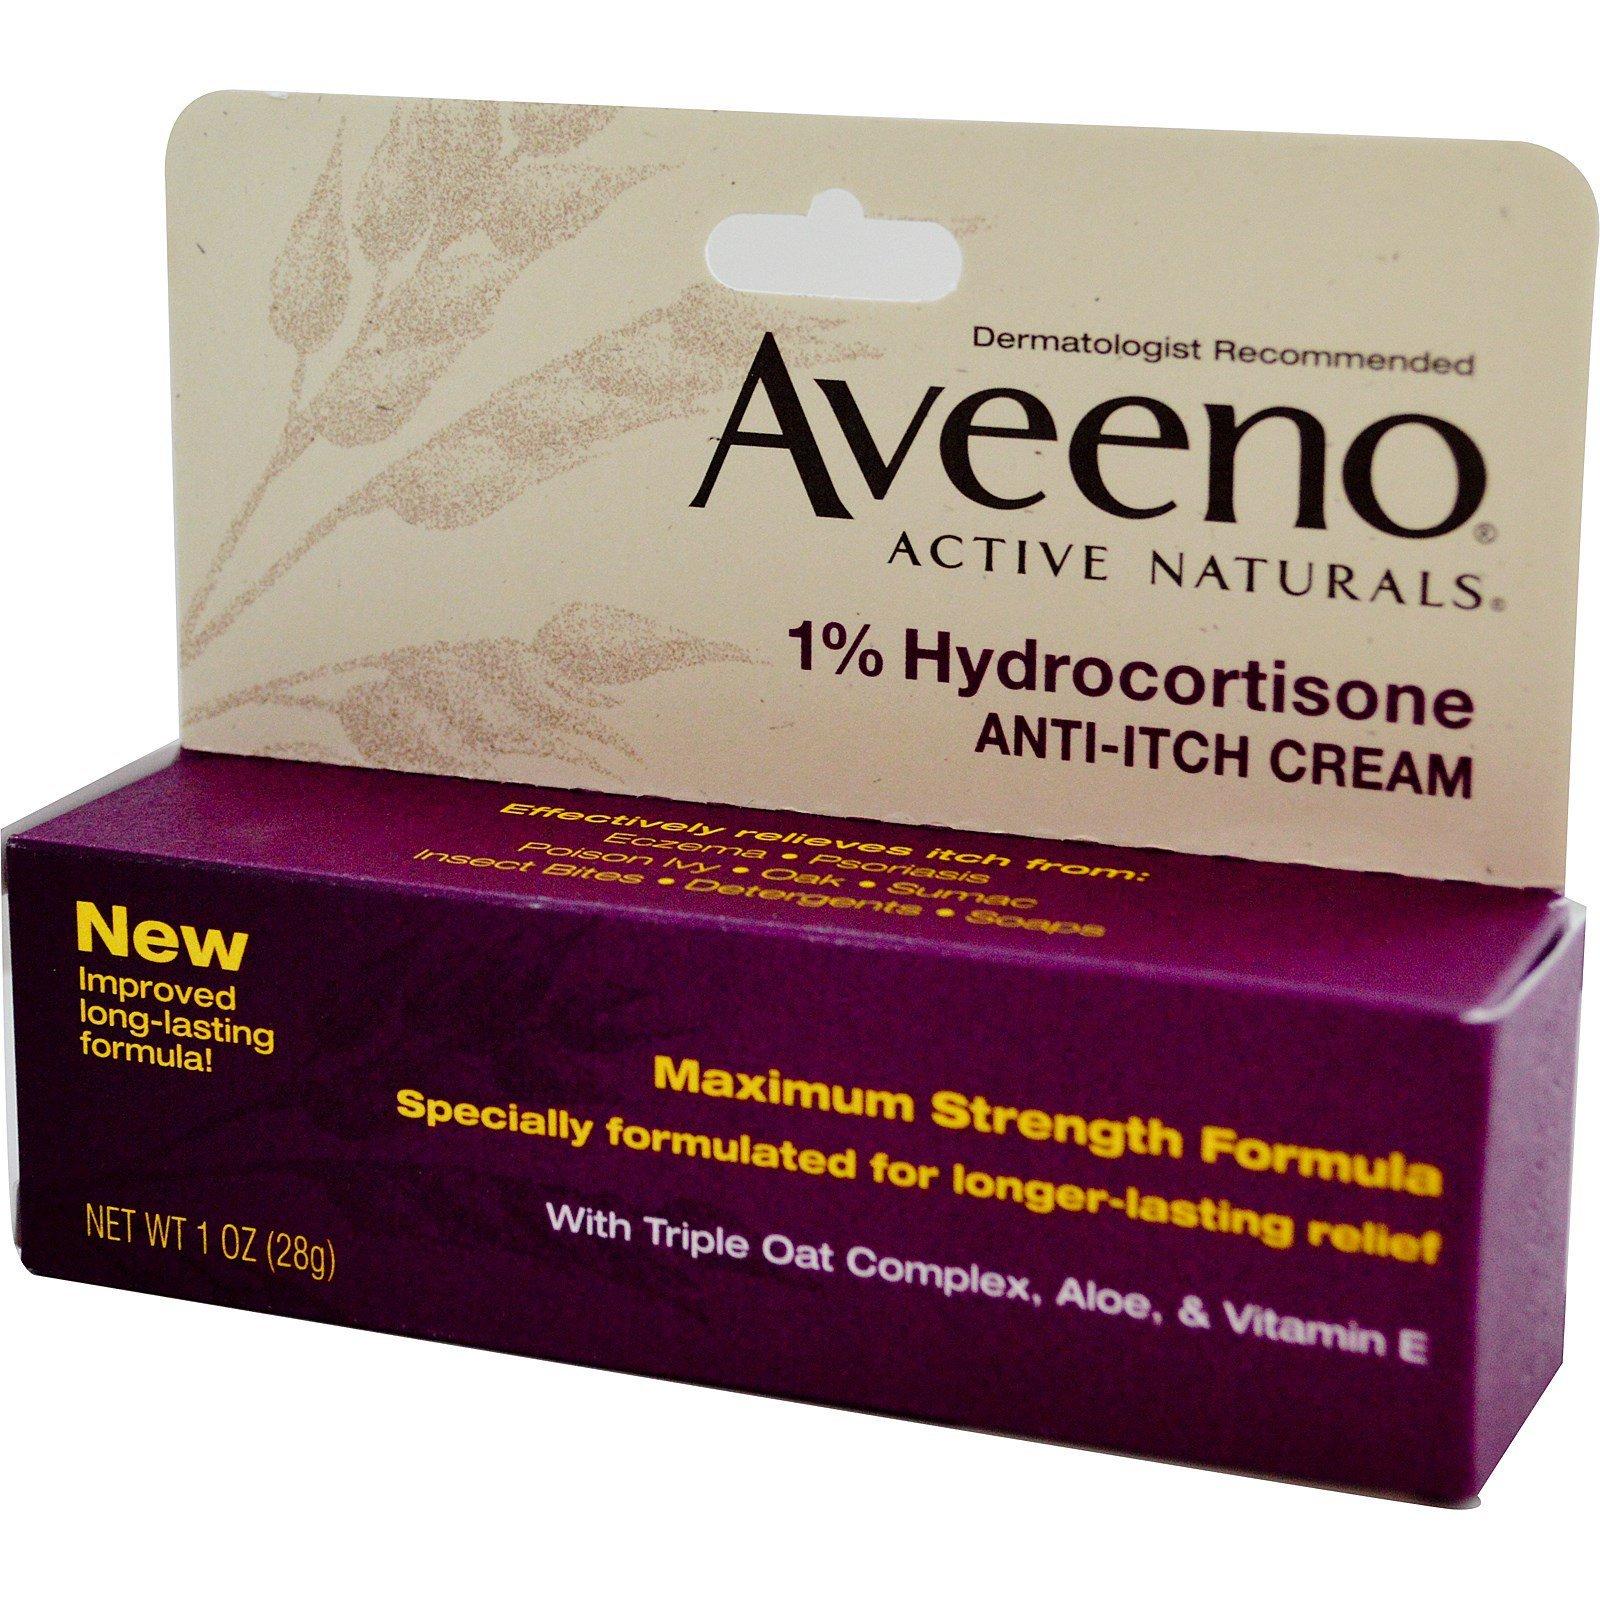 Aveeno, Active Naturals, 1% Hydrocortisone, Anti-Itch Cream, 1 oz